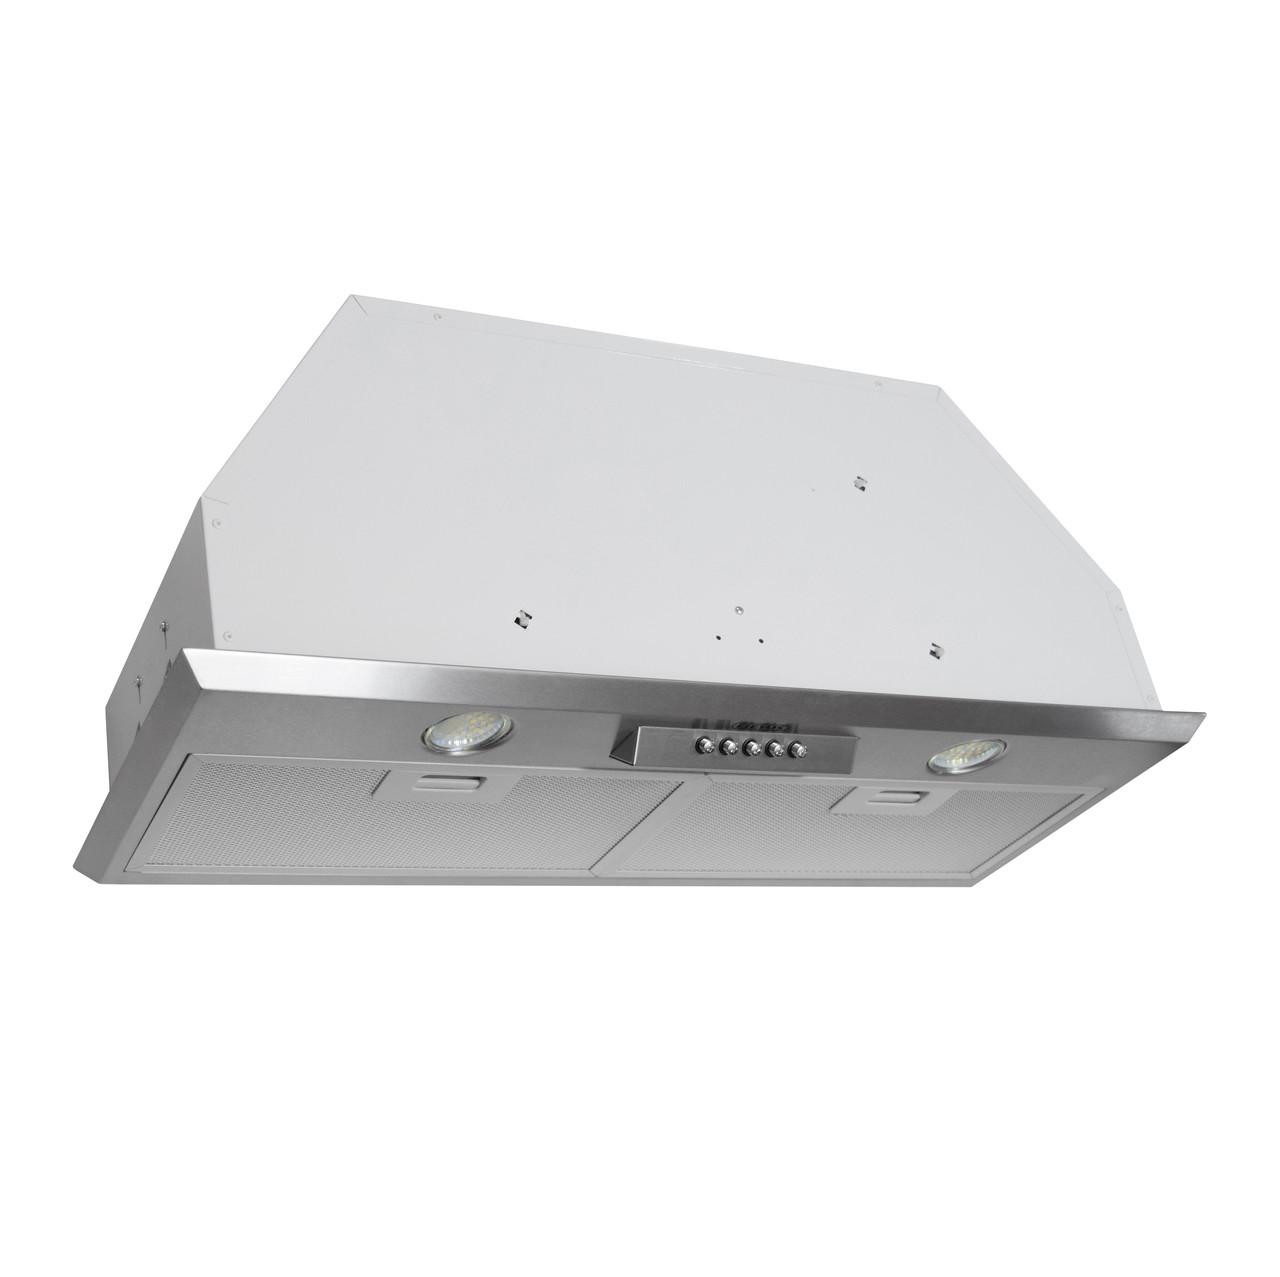 Витяжка вбудовувана кухонна ELEYUS Modul 1200 LED SMD 70 IS (нержавійка)